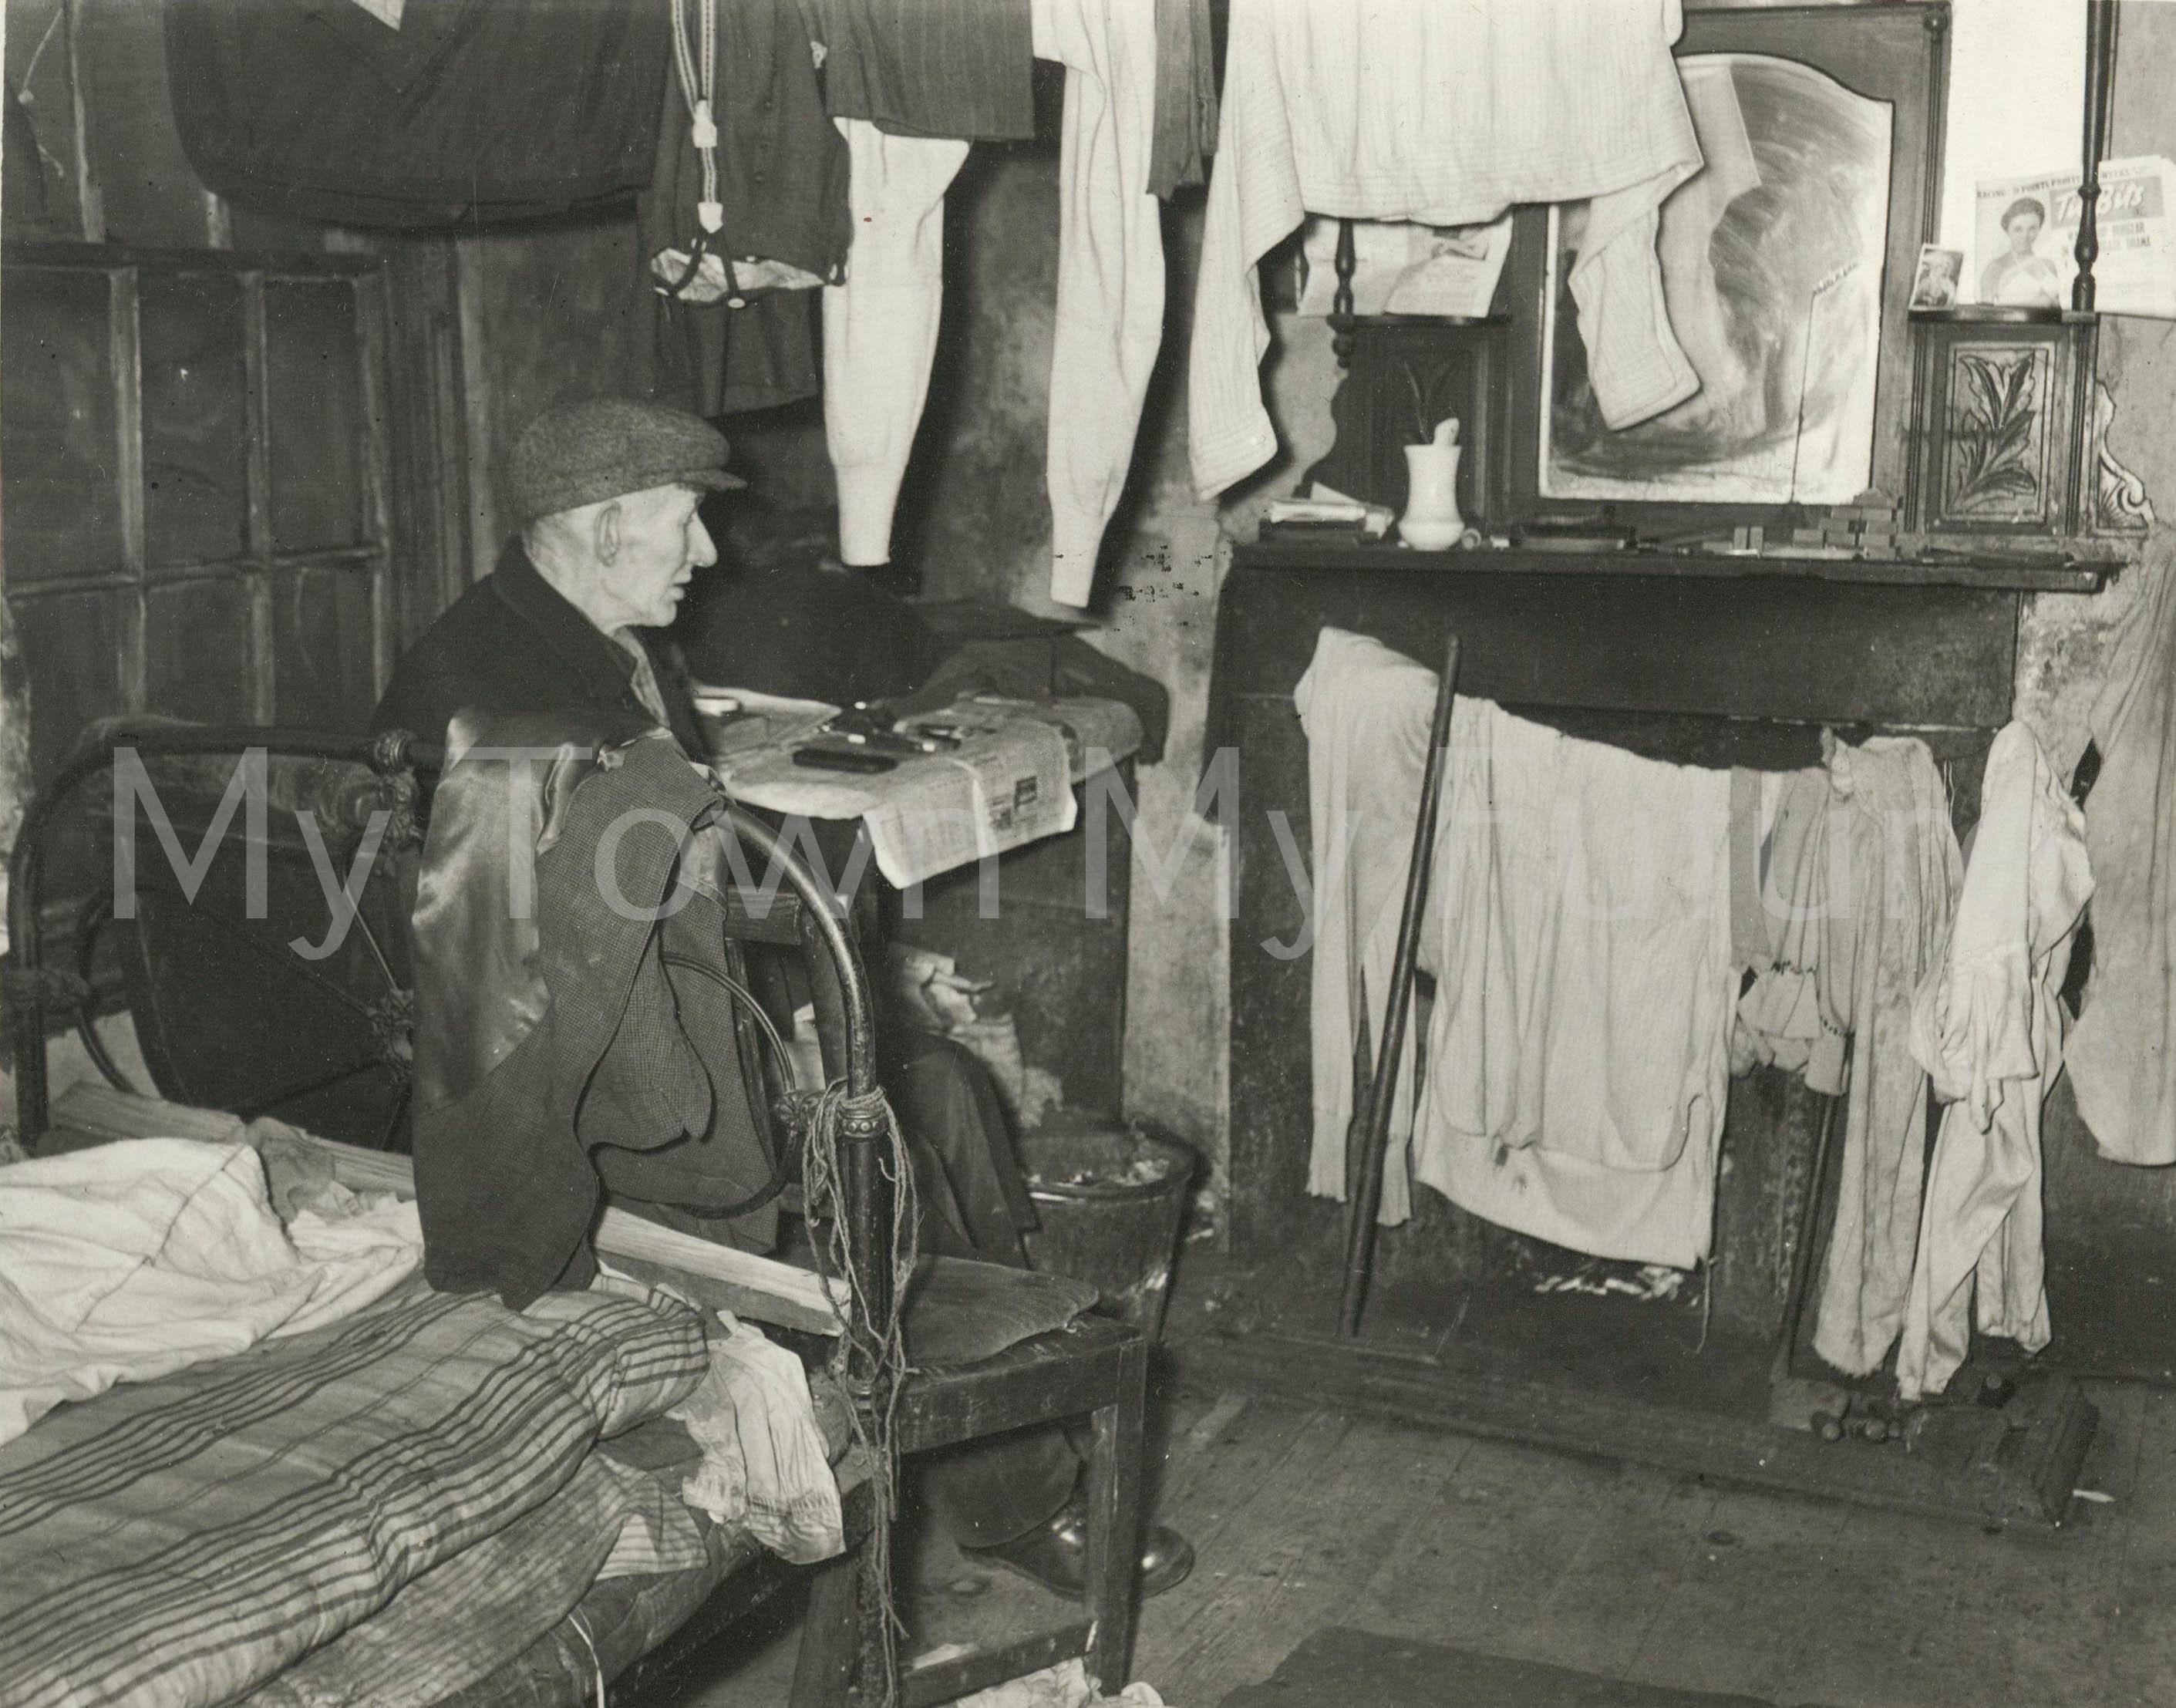 St Hilda's,Furnished Rooms,East Street